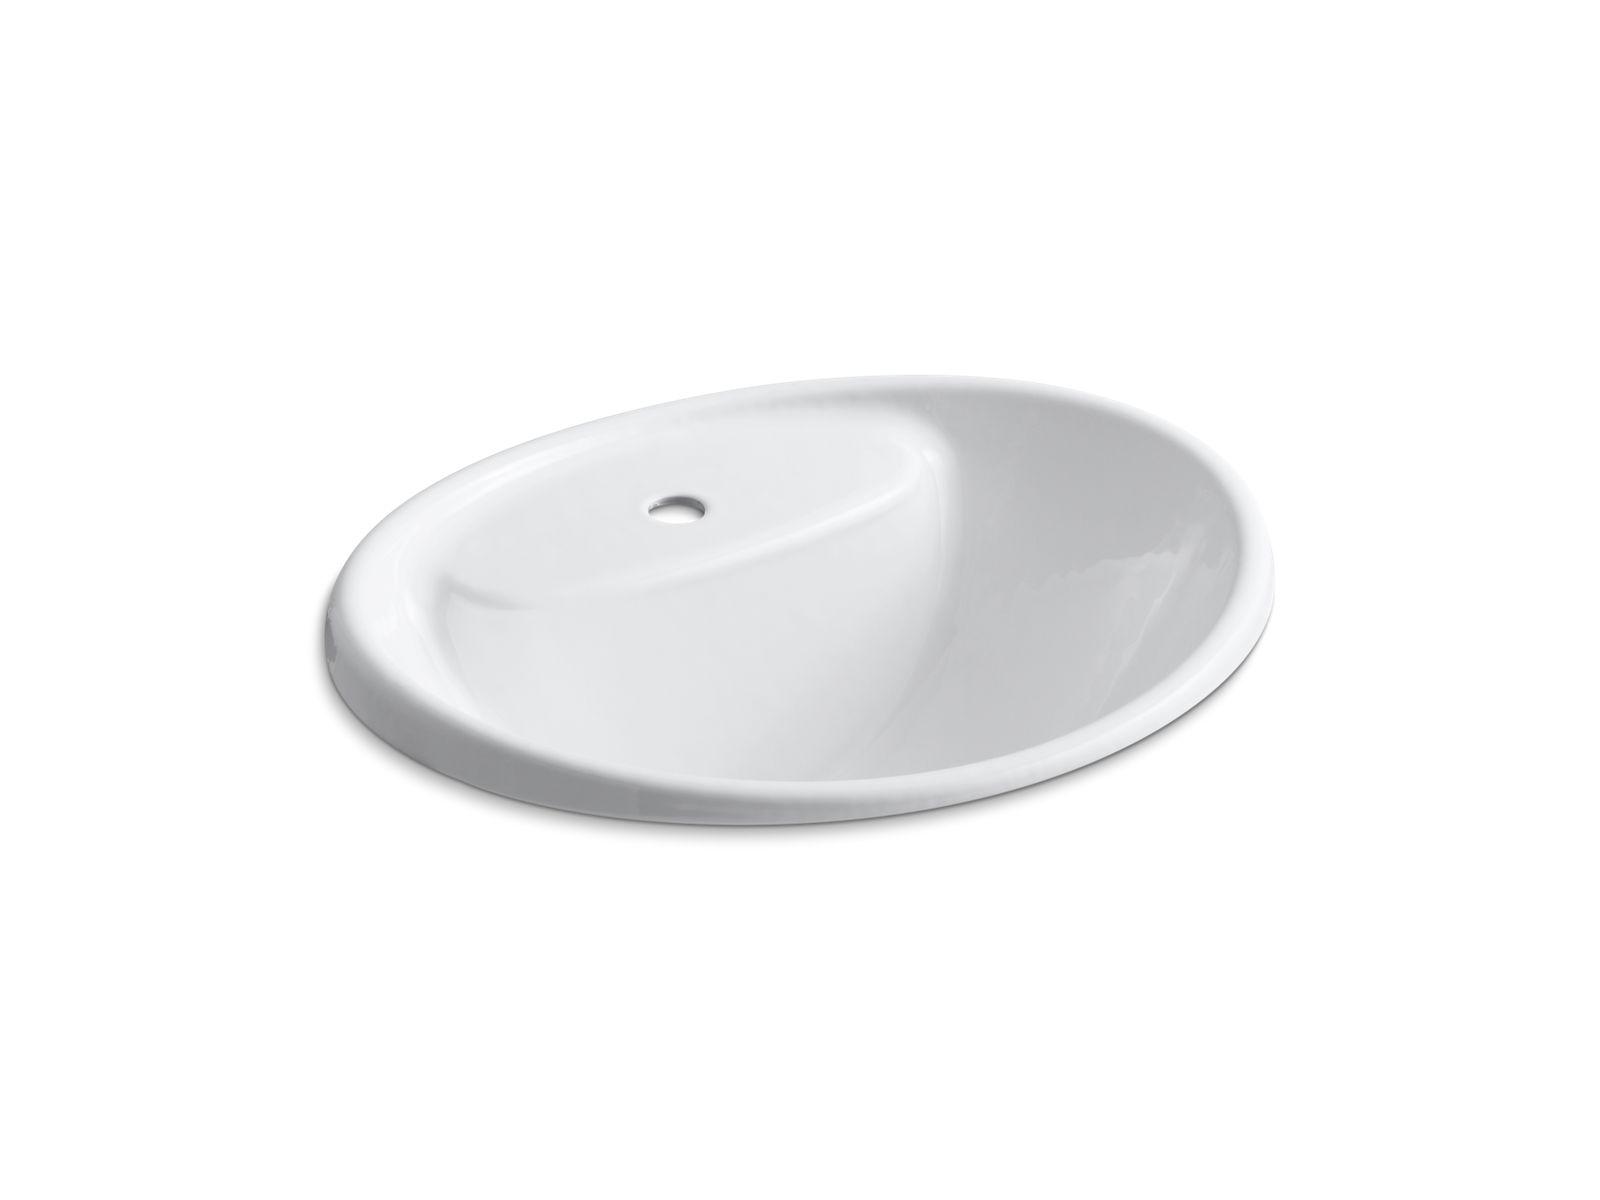 Tides Drop In Sink With Single Faucet Hole | K 2839 1 | KOHLER